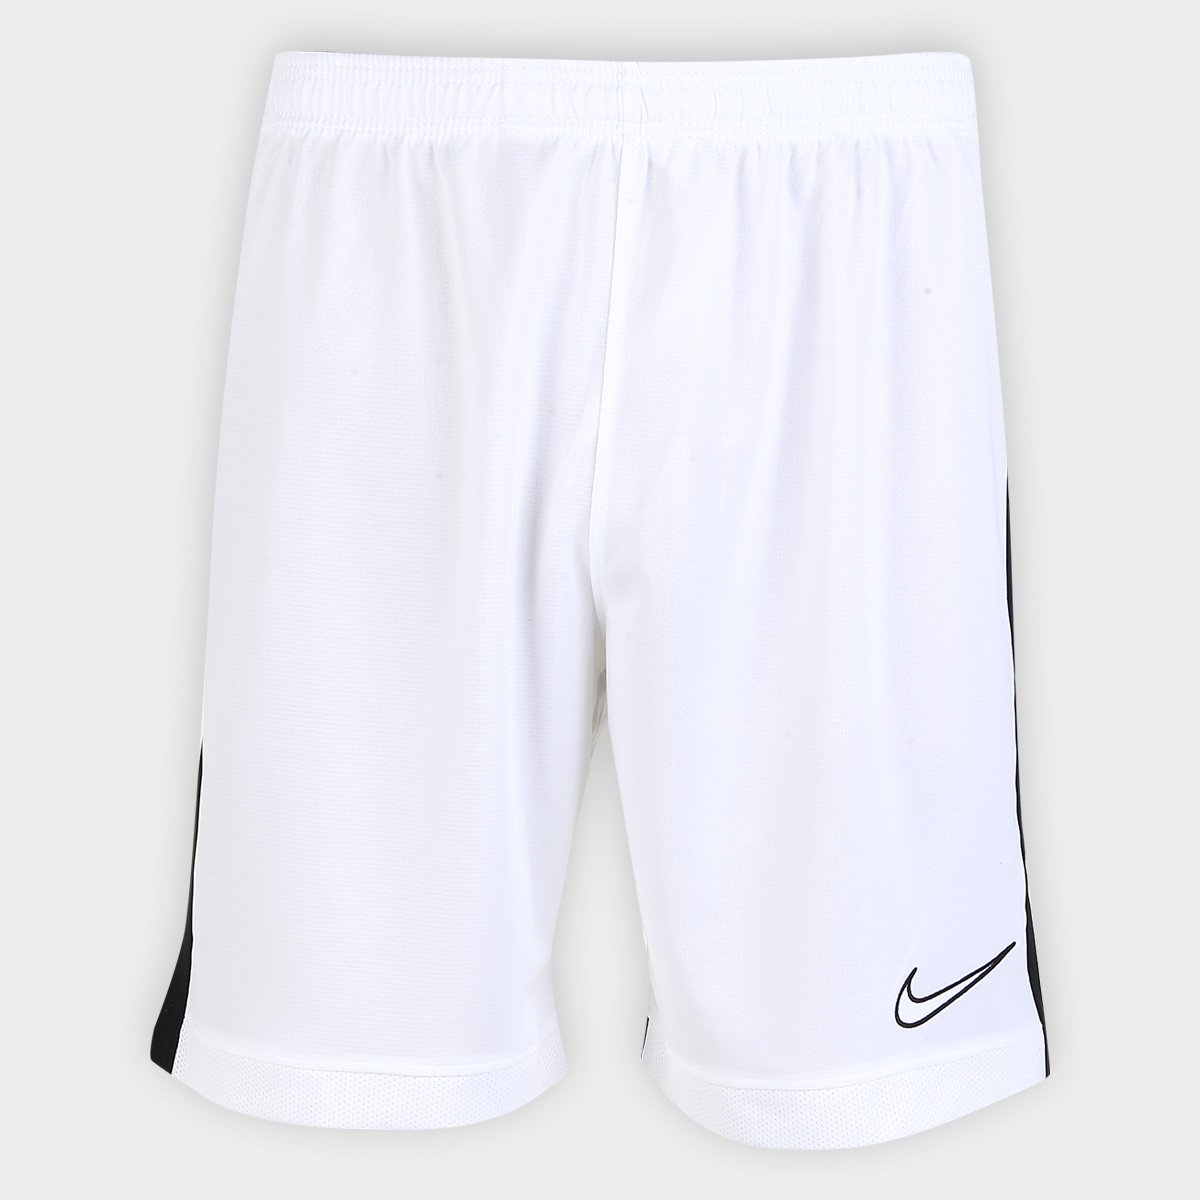 Calção Nike Dri-Fit Academy Masculino - Branco e Preto - Compre ... dd39ddfc57079